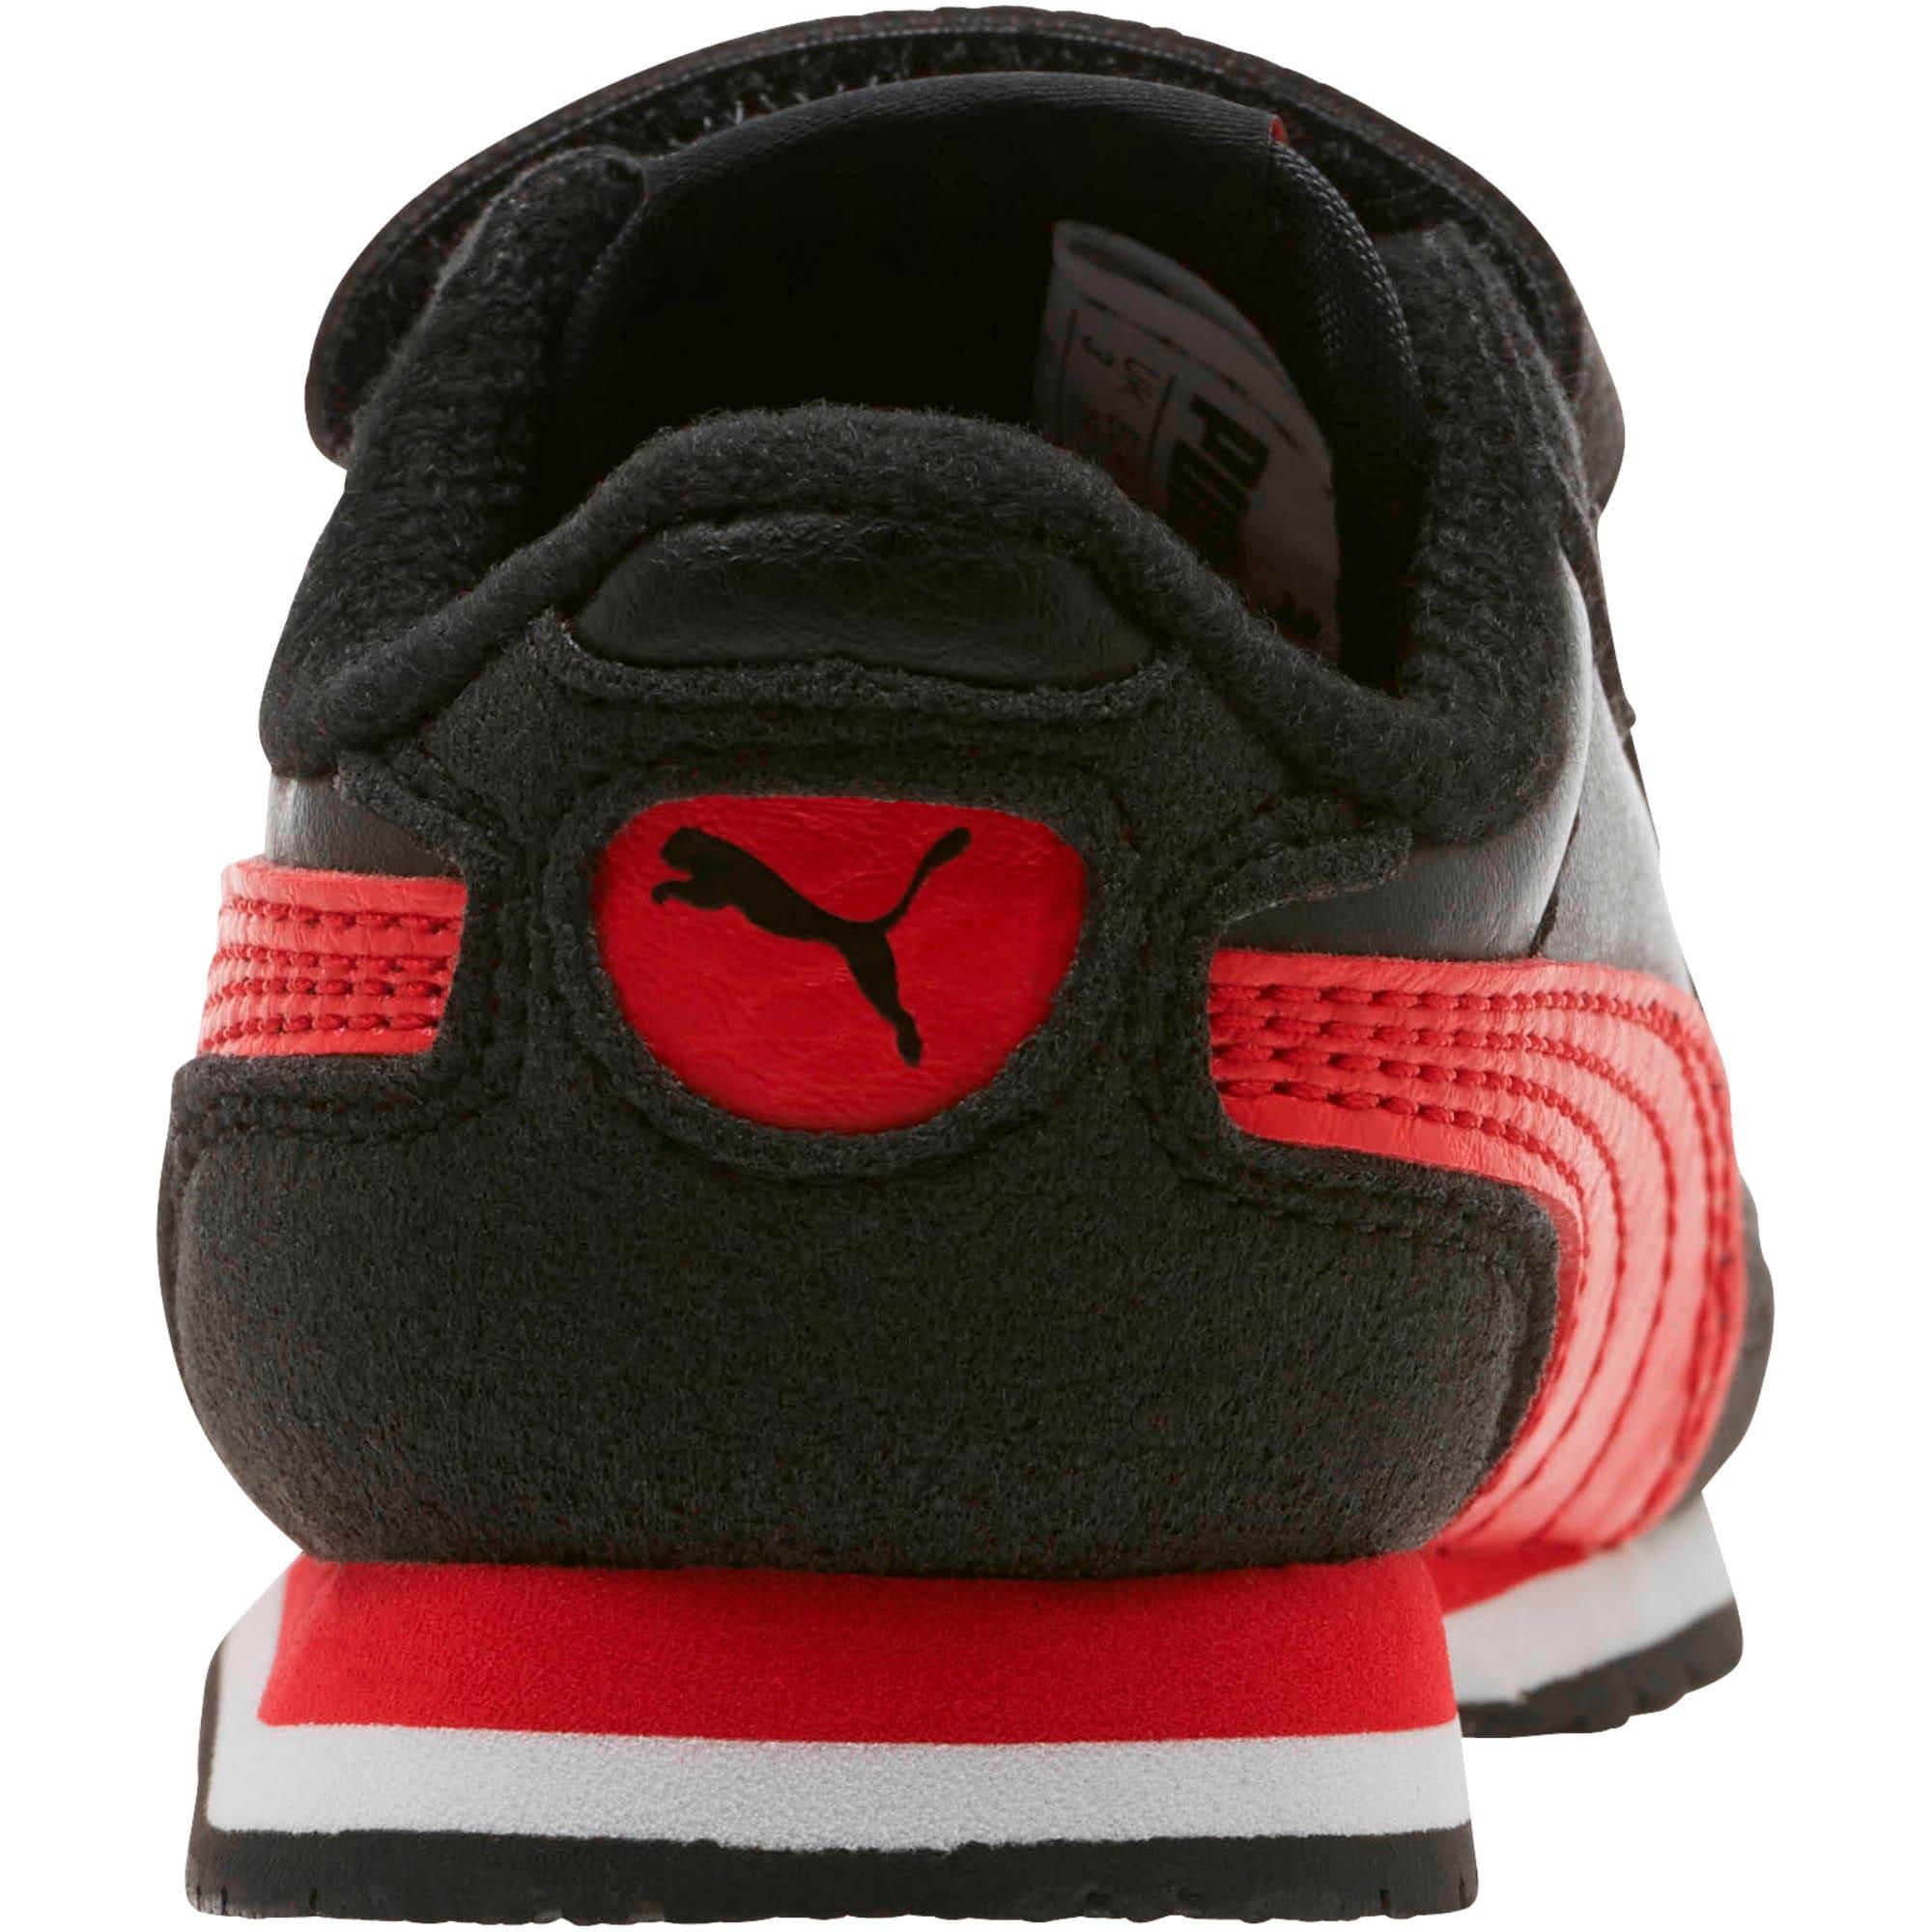 Thumbnail 3 of Cabana Racer SL Toddler Shoes, Puma Black-High Risk Red, medium